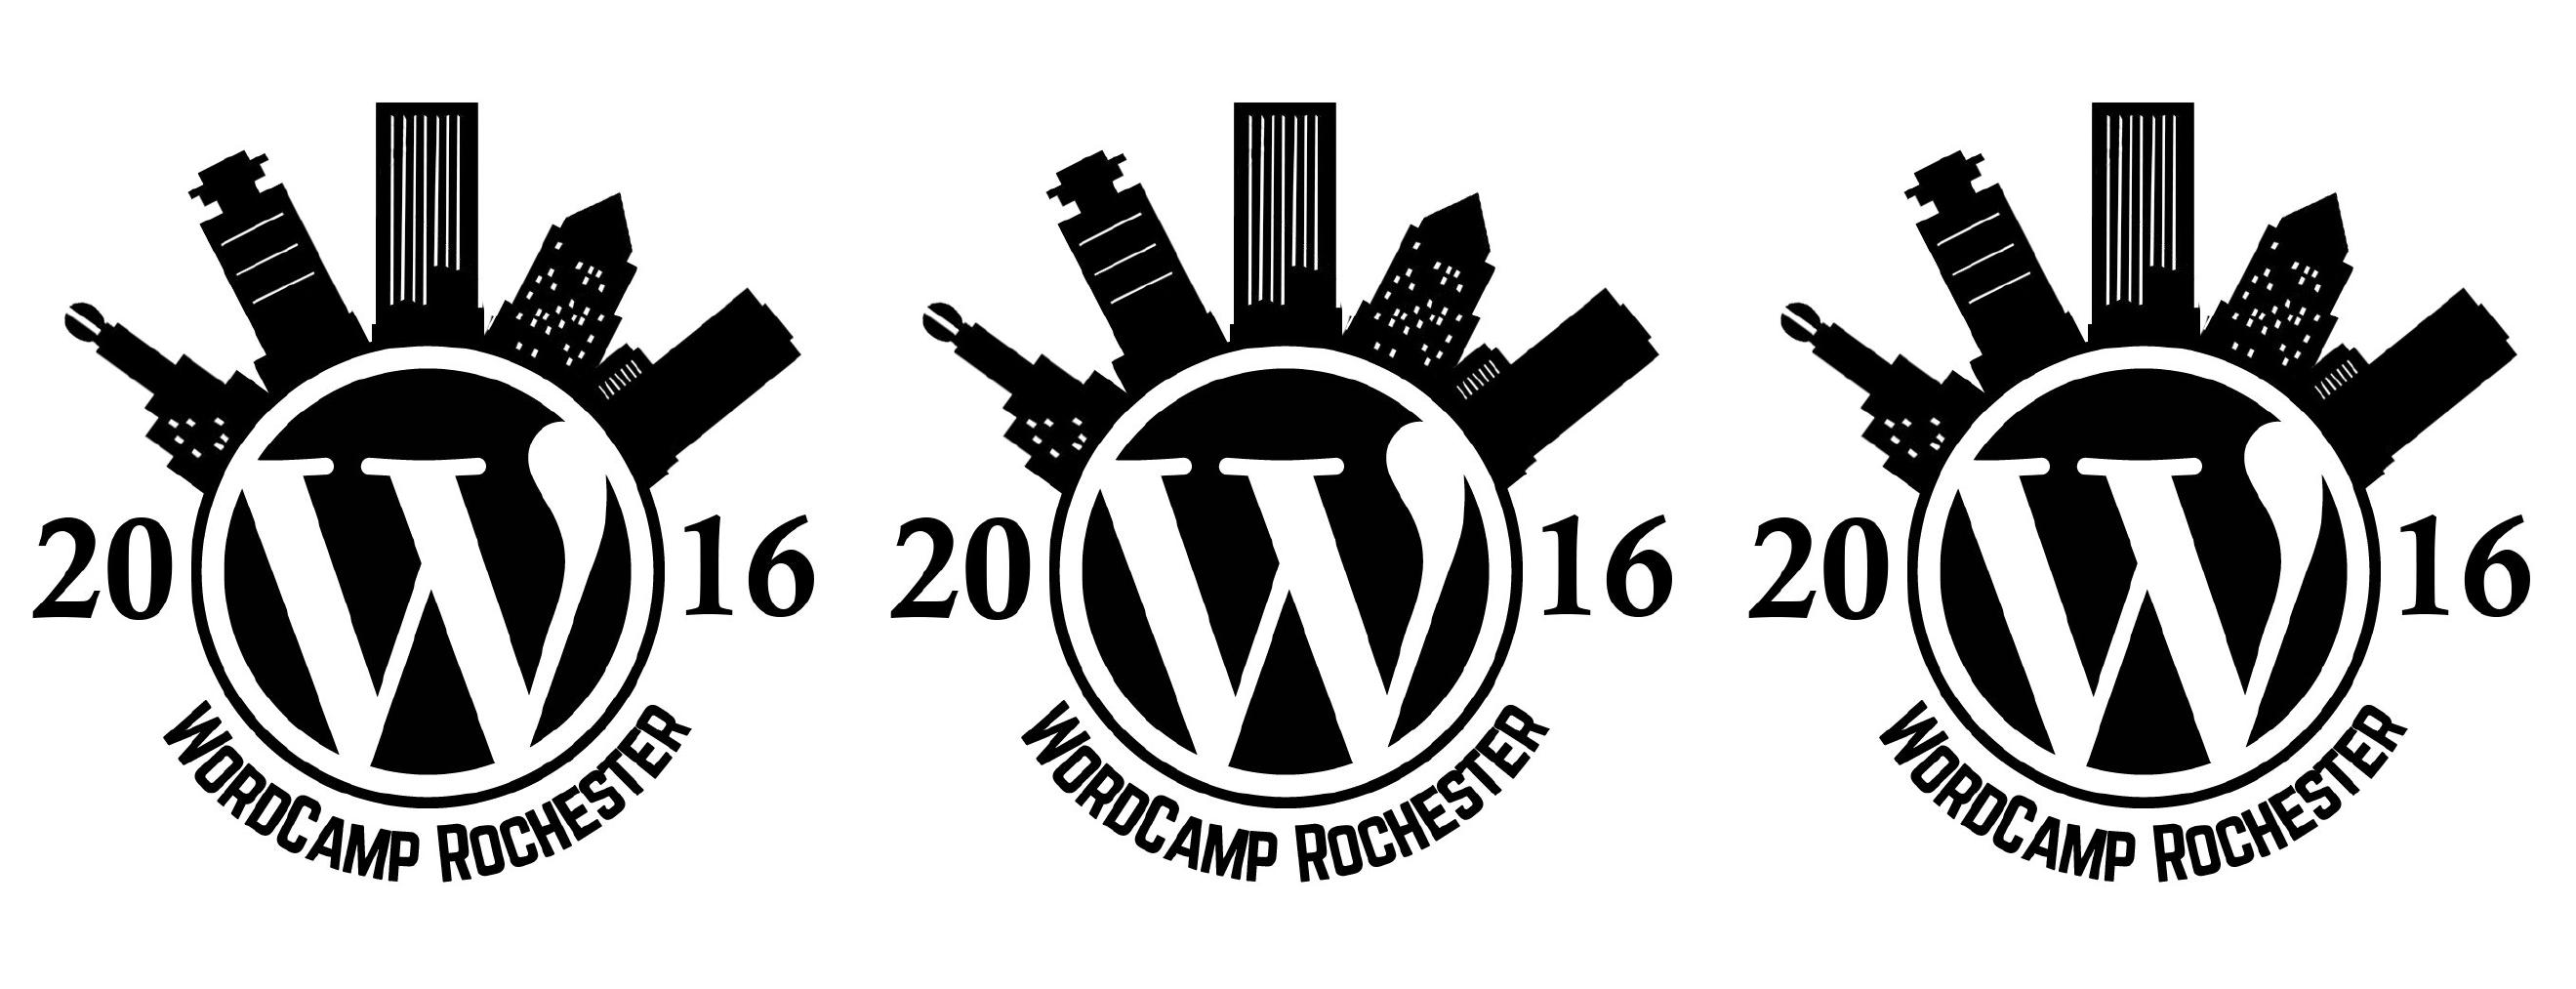 WordCamp Rochester 2016